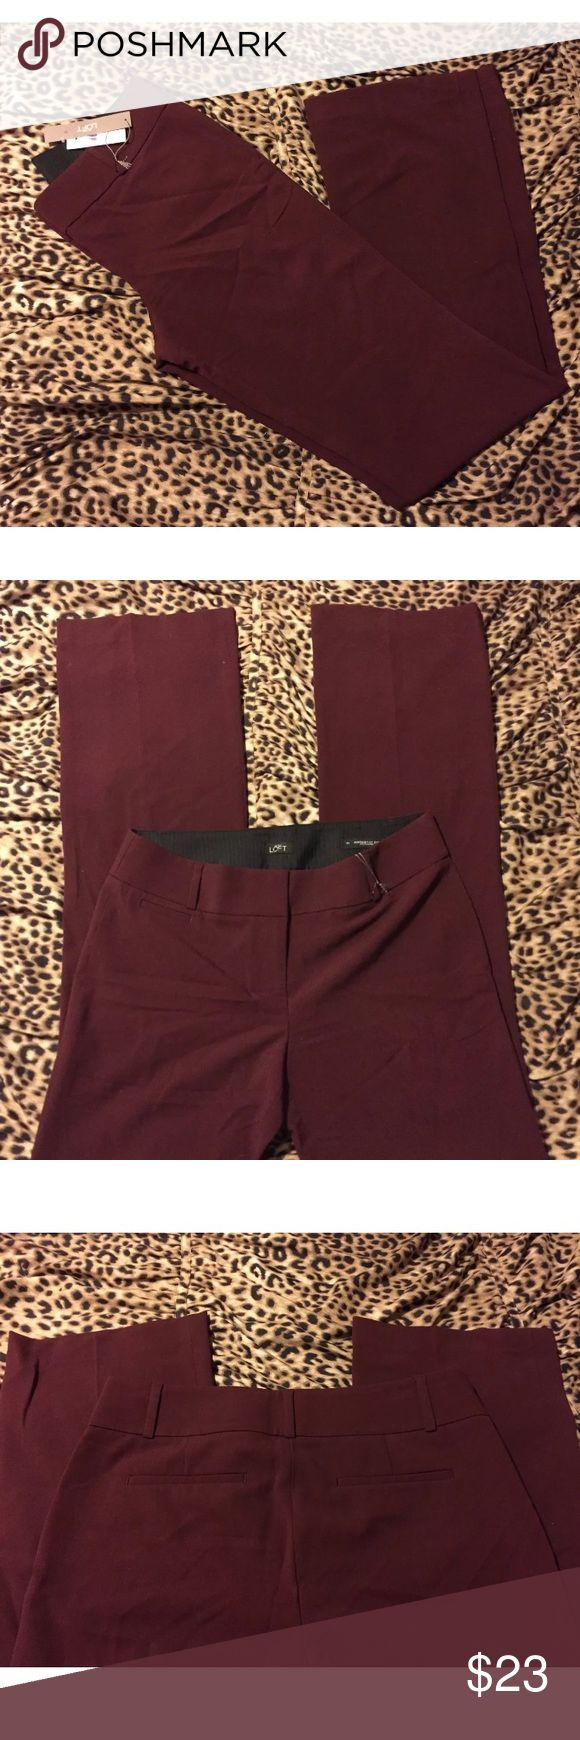 "Ann Taylor LOFT ""Marisa"" Burgundy Boot Cut Pants Ann Taylor LOFT ""Marisa"" burgundy boot cut dress pants Women's size 4 TALL!  66% Polyester, 30% Rayon, 4% Spandex  Waist: 32"" Inseam: 38"" Ann Taylor Pants Trousers"